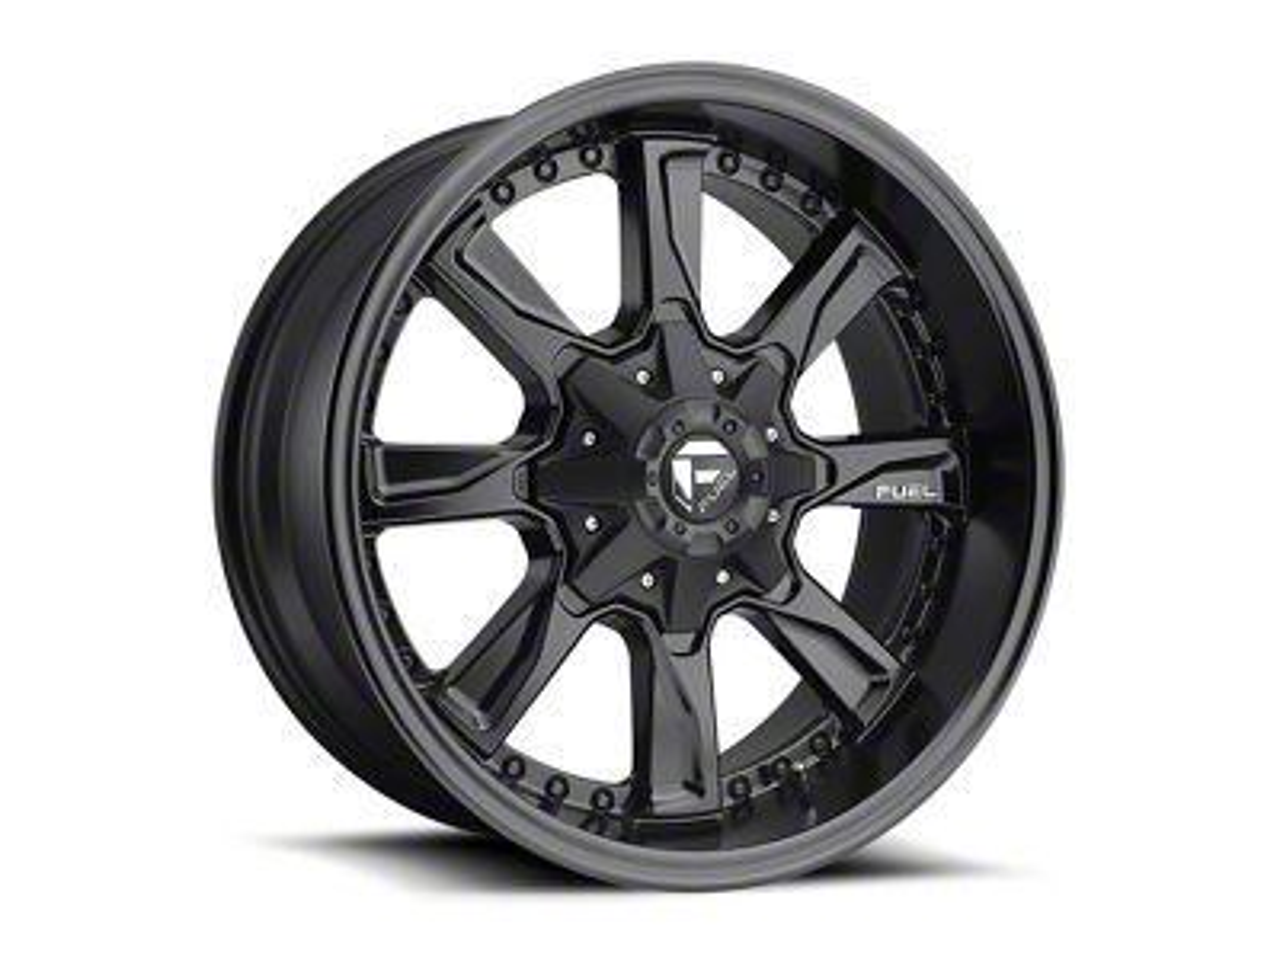 Fuel Wheels Hydro Matte Black 5-Lug Wheel - 20x9 (02-18 RAM 1500, Excluding Mega Cab)